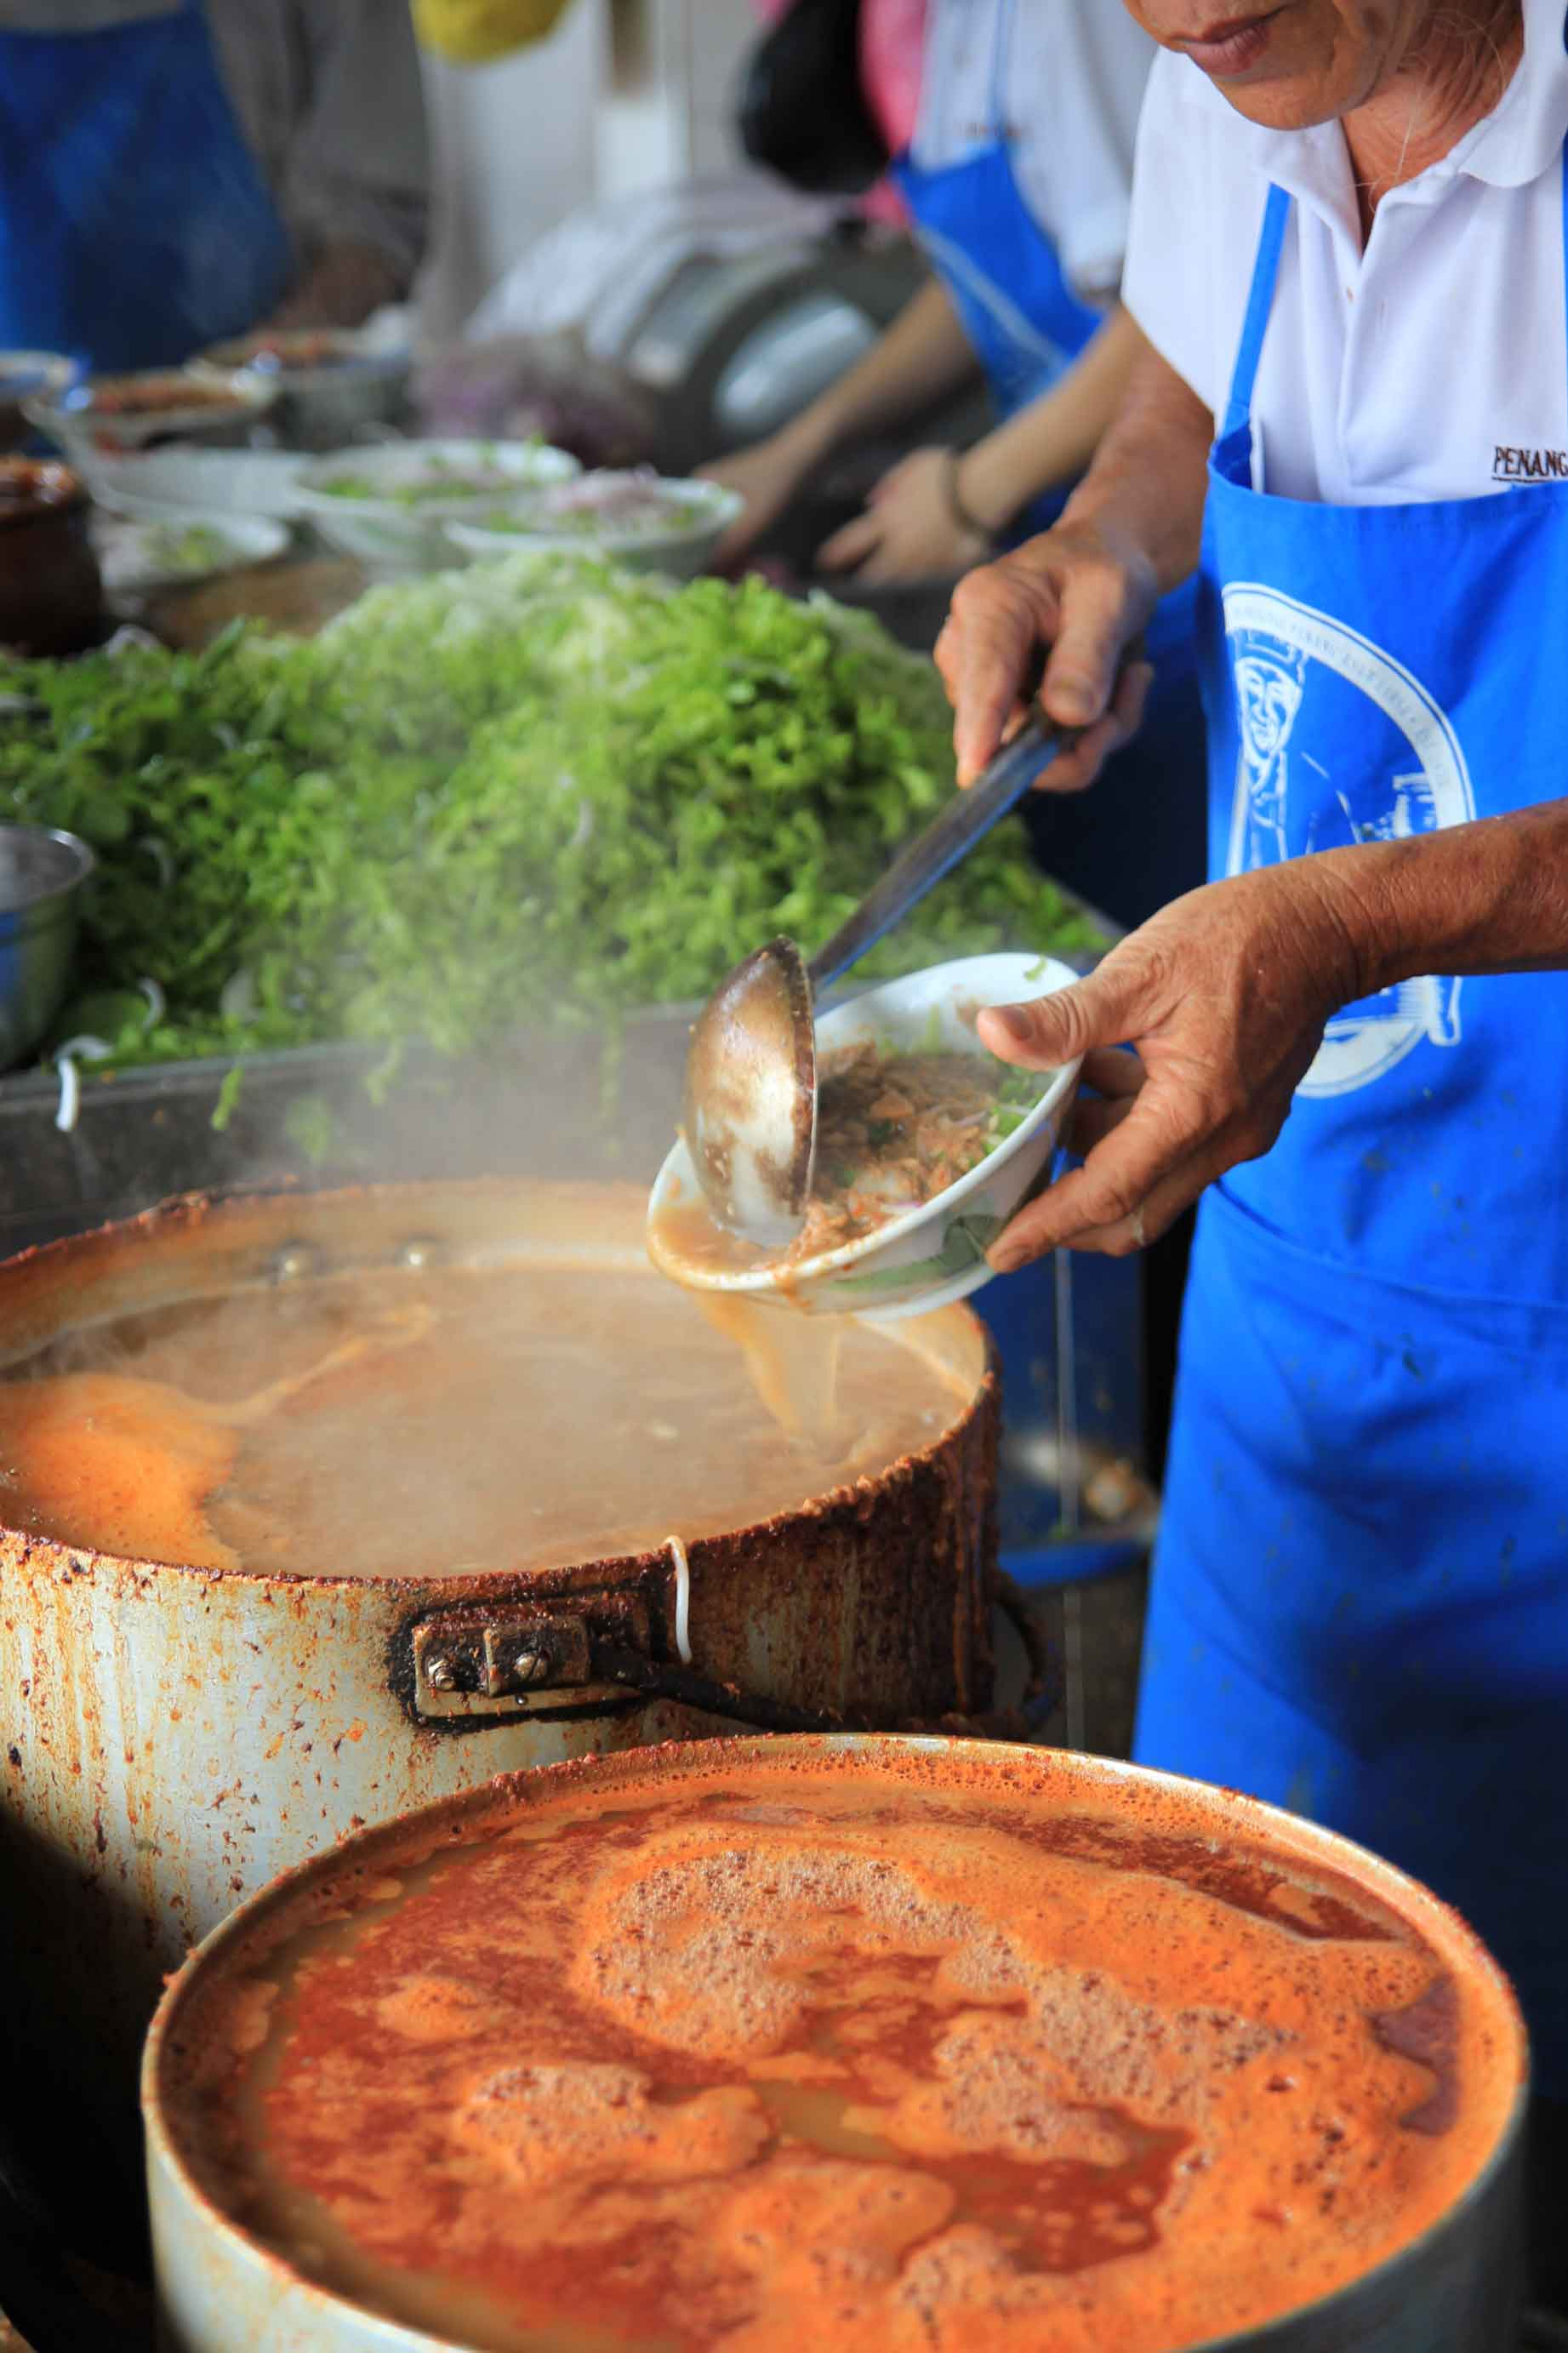 Penang's Famous Assam Laksa